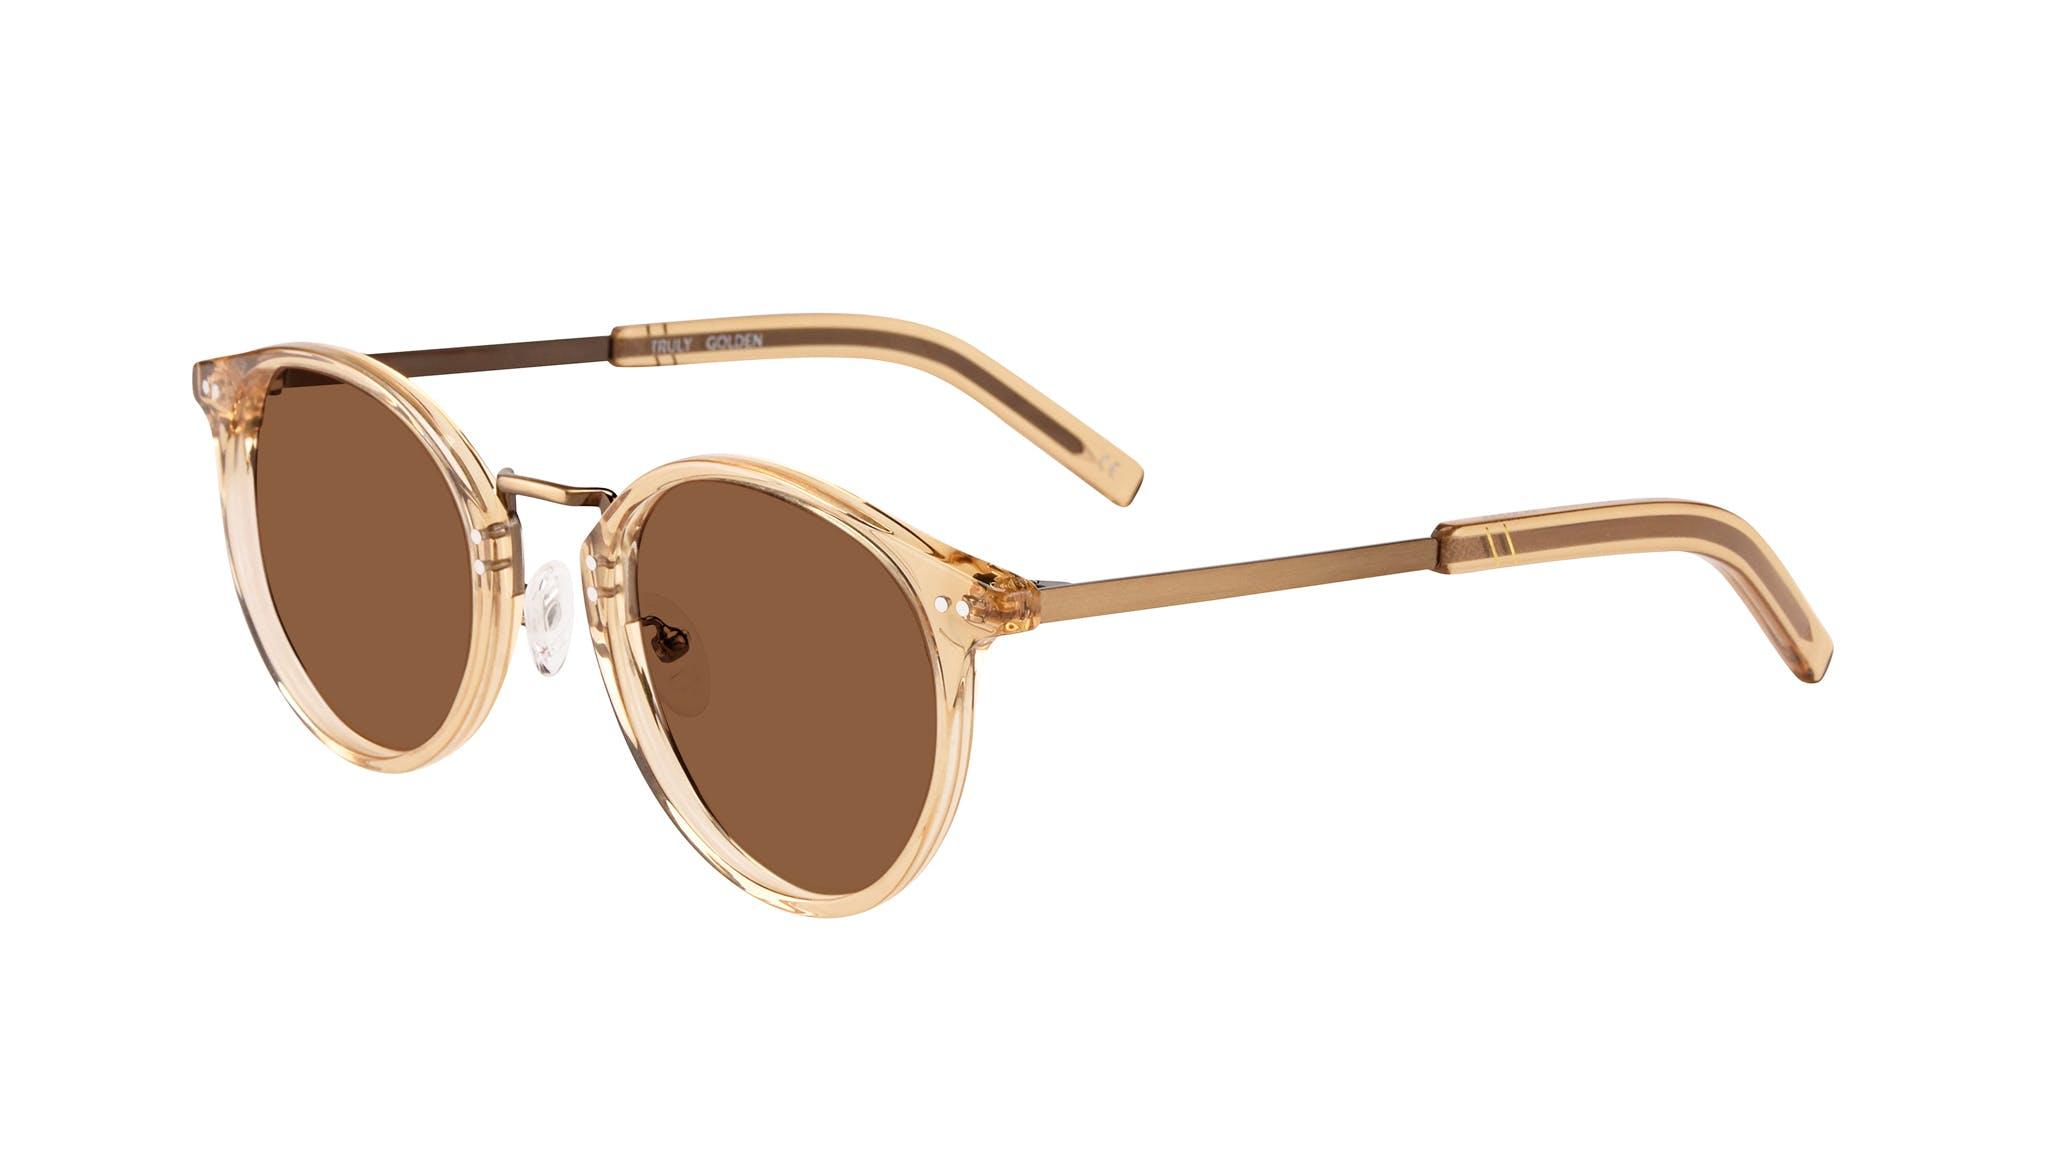 Affordable Fashion Glasses Round Sunglasses Men Truly Golden Tilt